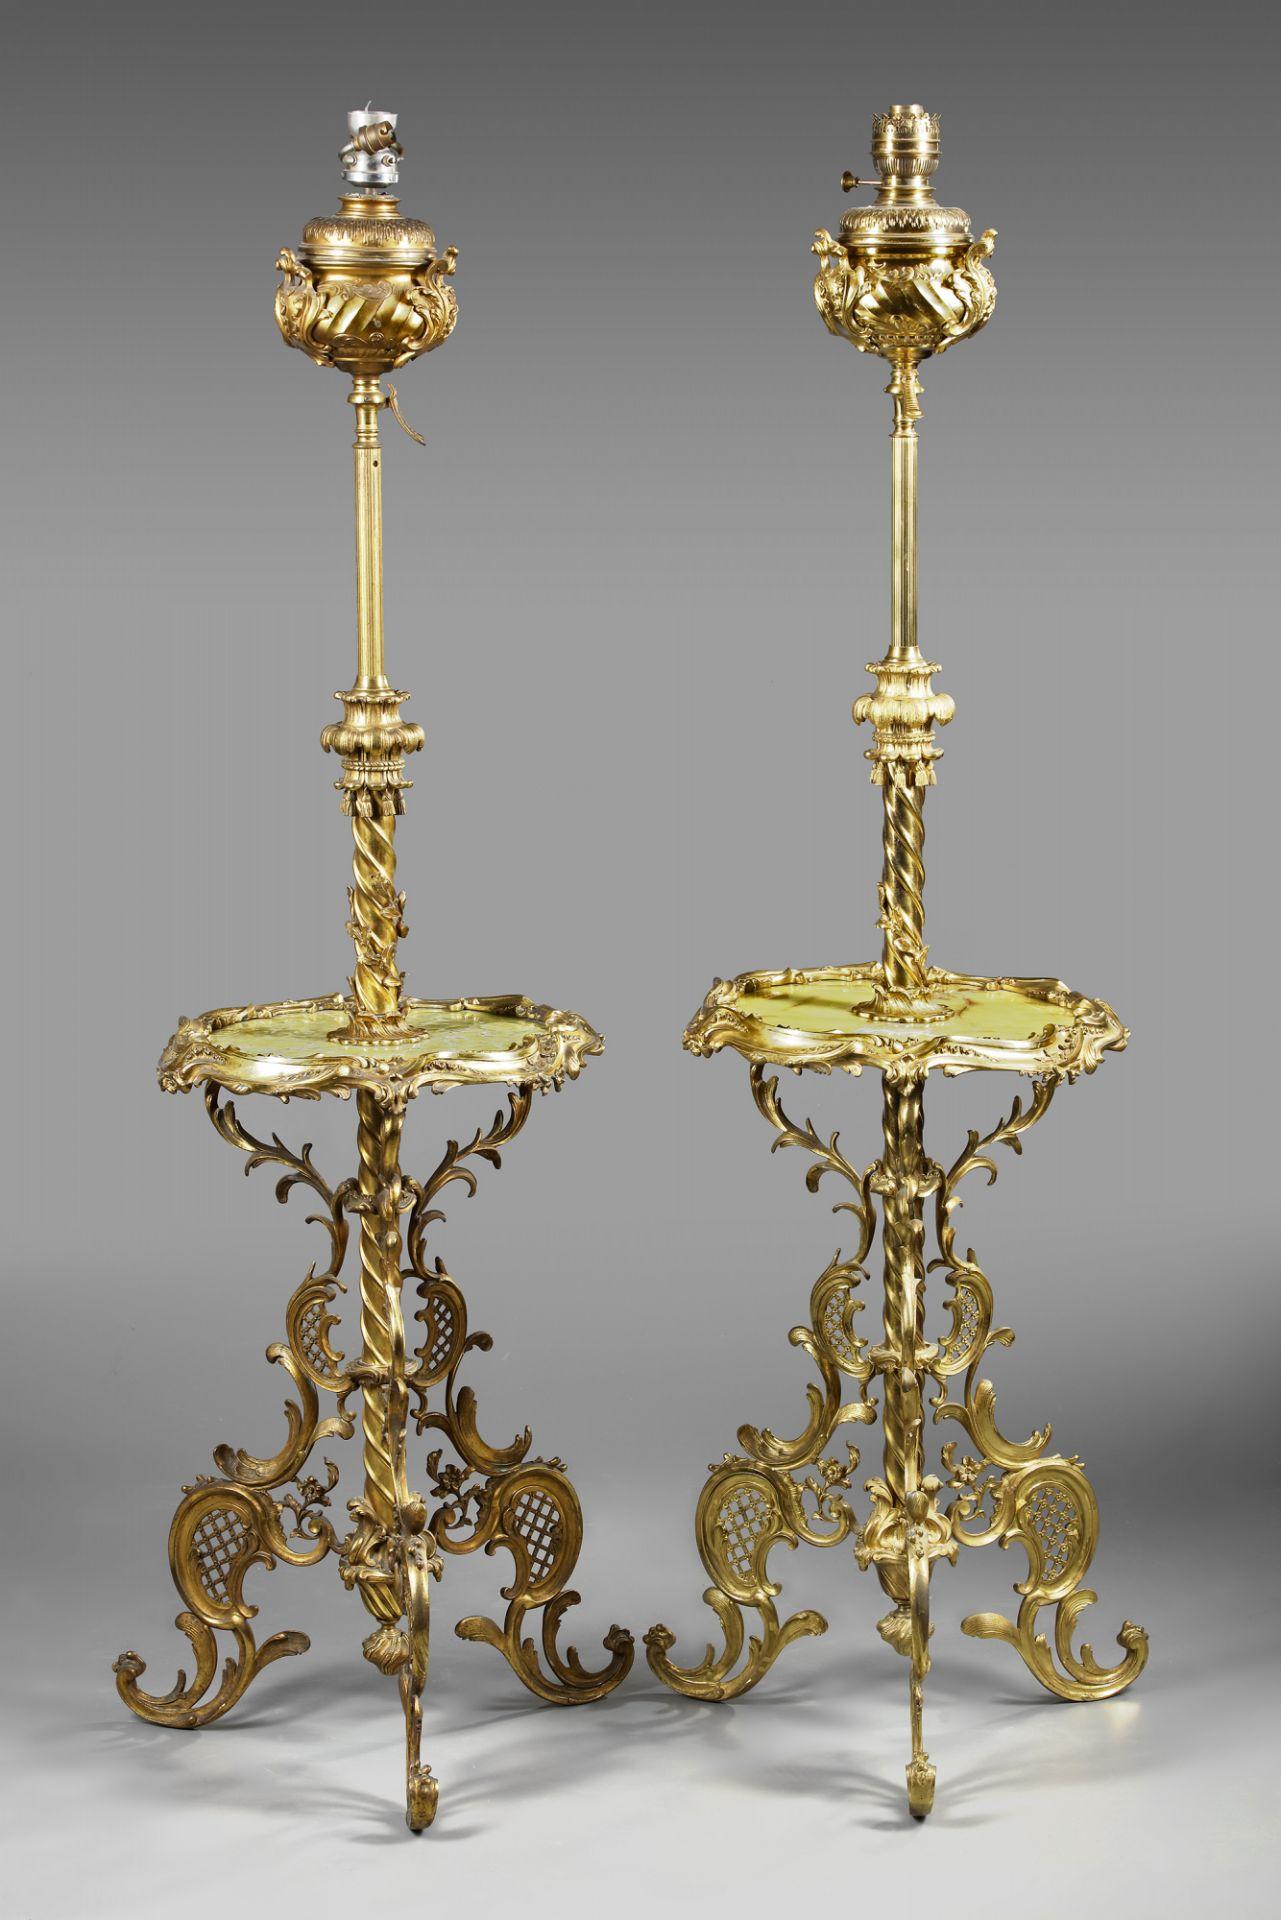 A PAIR OF ORMOLU FLOOR LAMPS, 19TH CENTURY